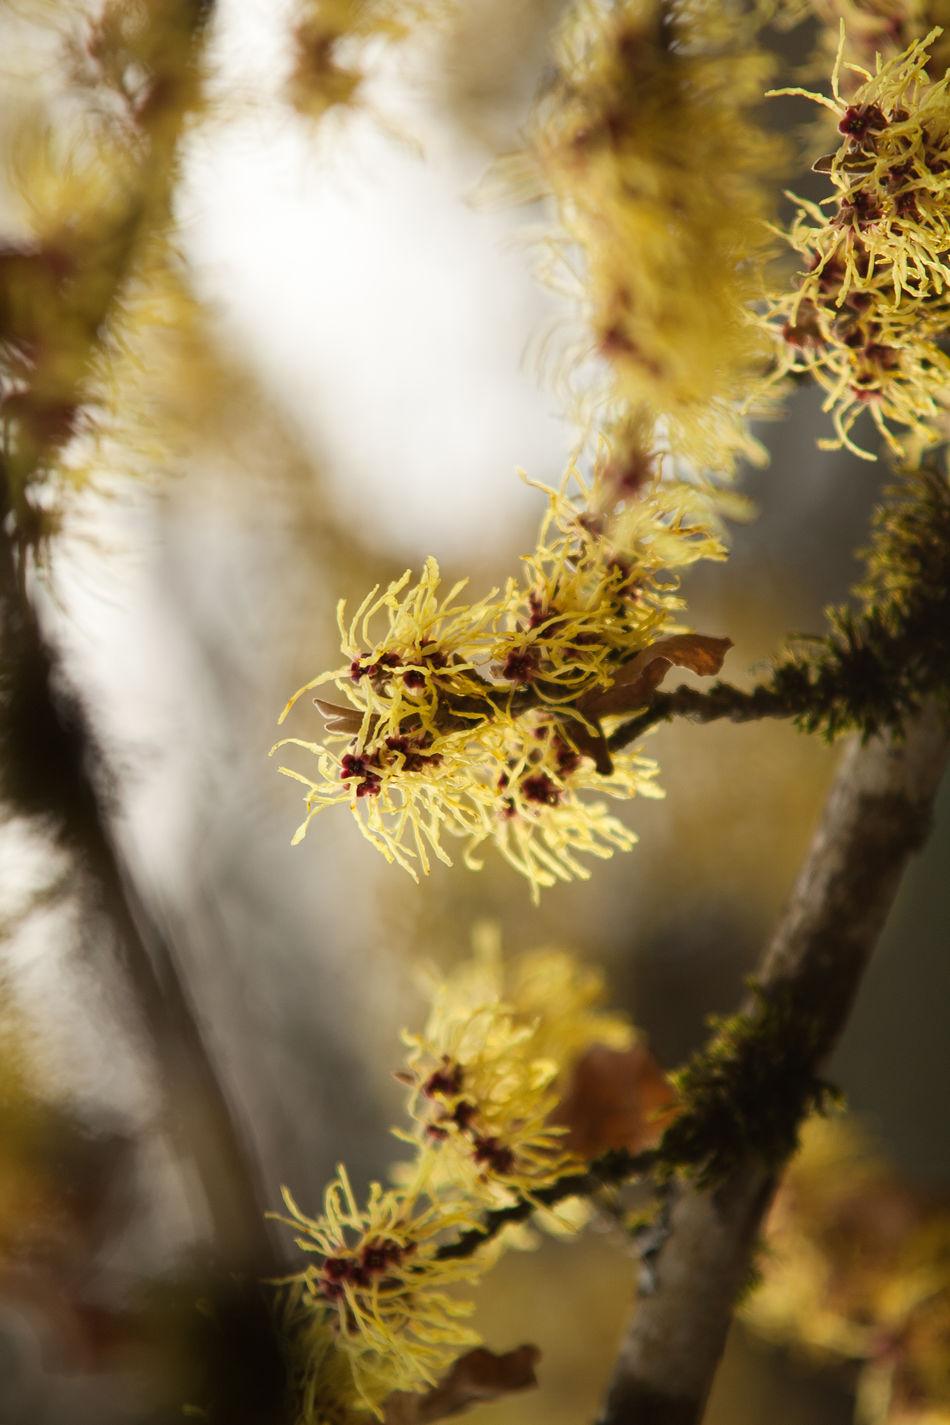 Witch hazel in flower Flower Hamamelis Nature Outdoors Plant Tree Witch Hazel Witch Hazel Flower Witch Hazel Plant Yellow Yellow Flower